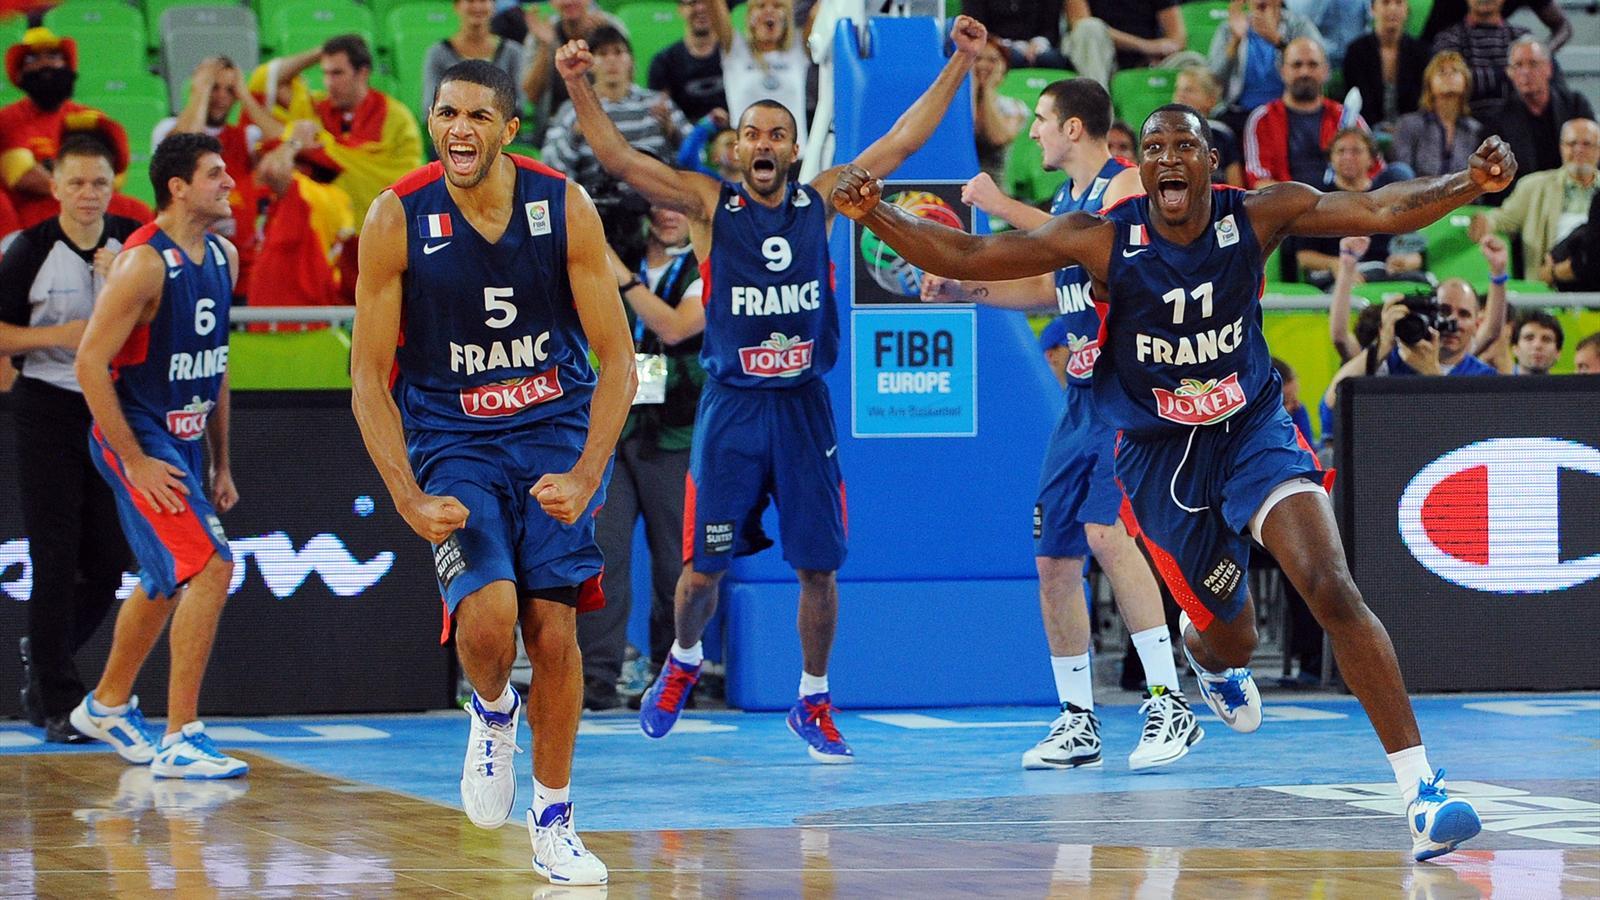 Rencontre basket france espagne